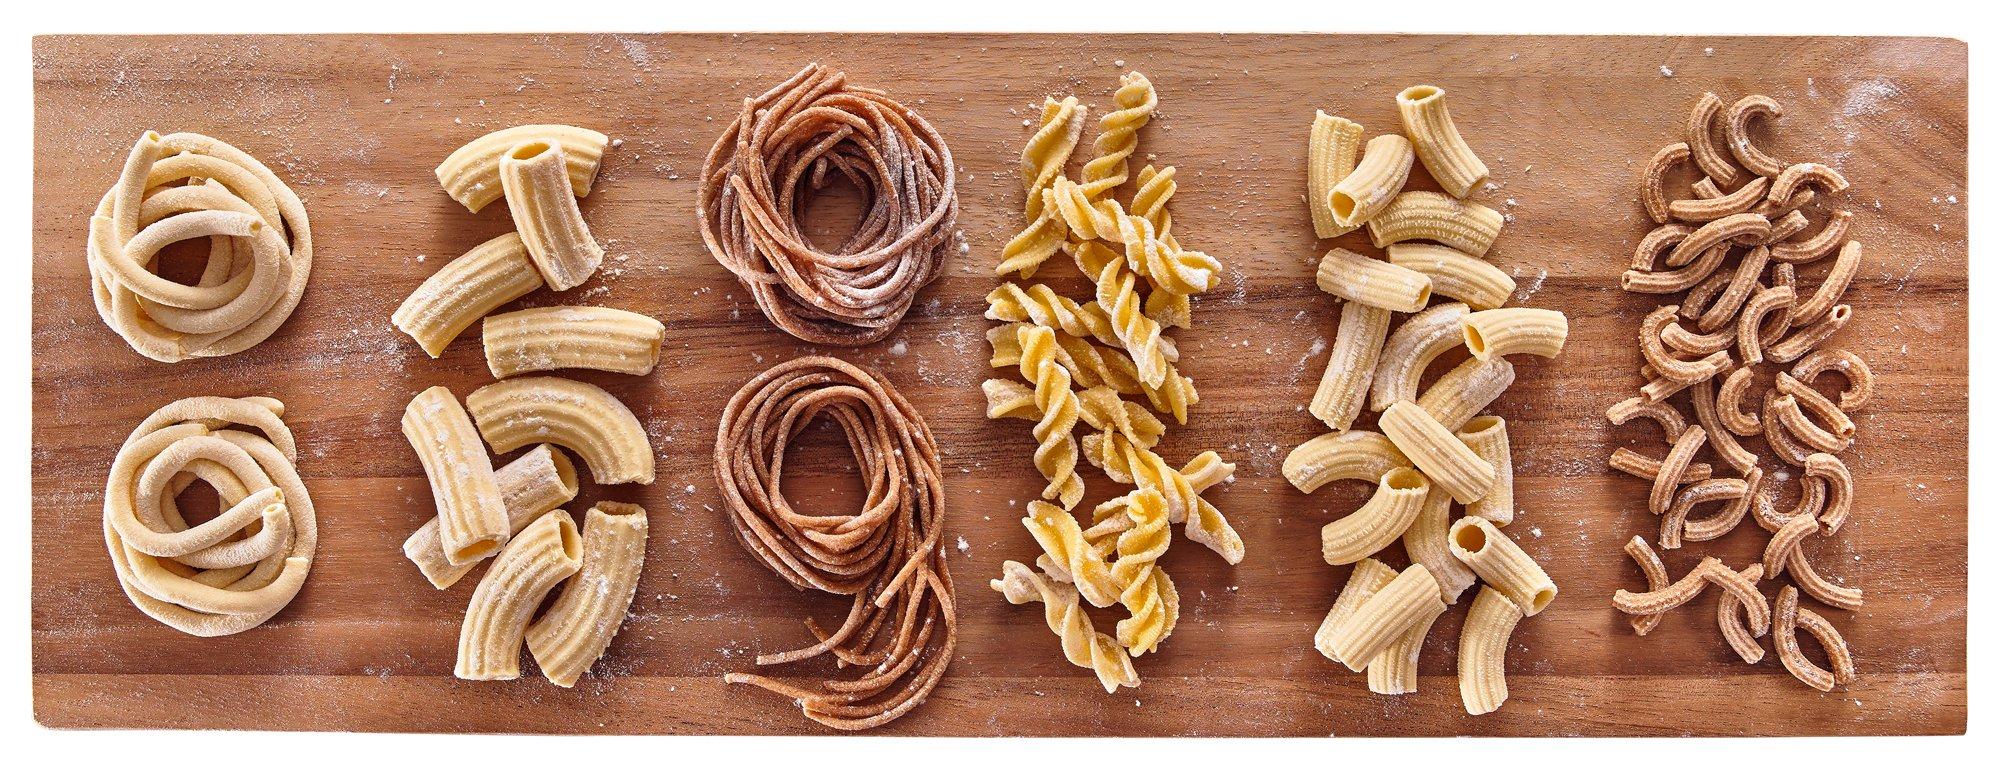 KitchenAid KSMPEXTA Gourmet Pasta Press Attachment with 6 Interchangeable Pasta Plates by KitchenAid (Image #3)